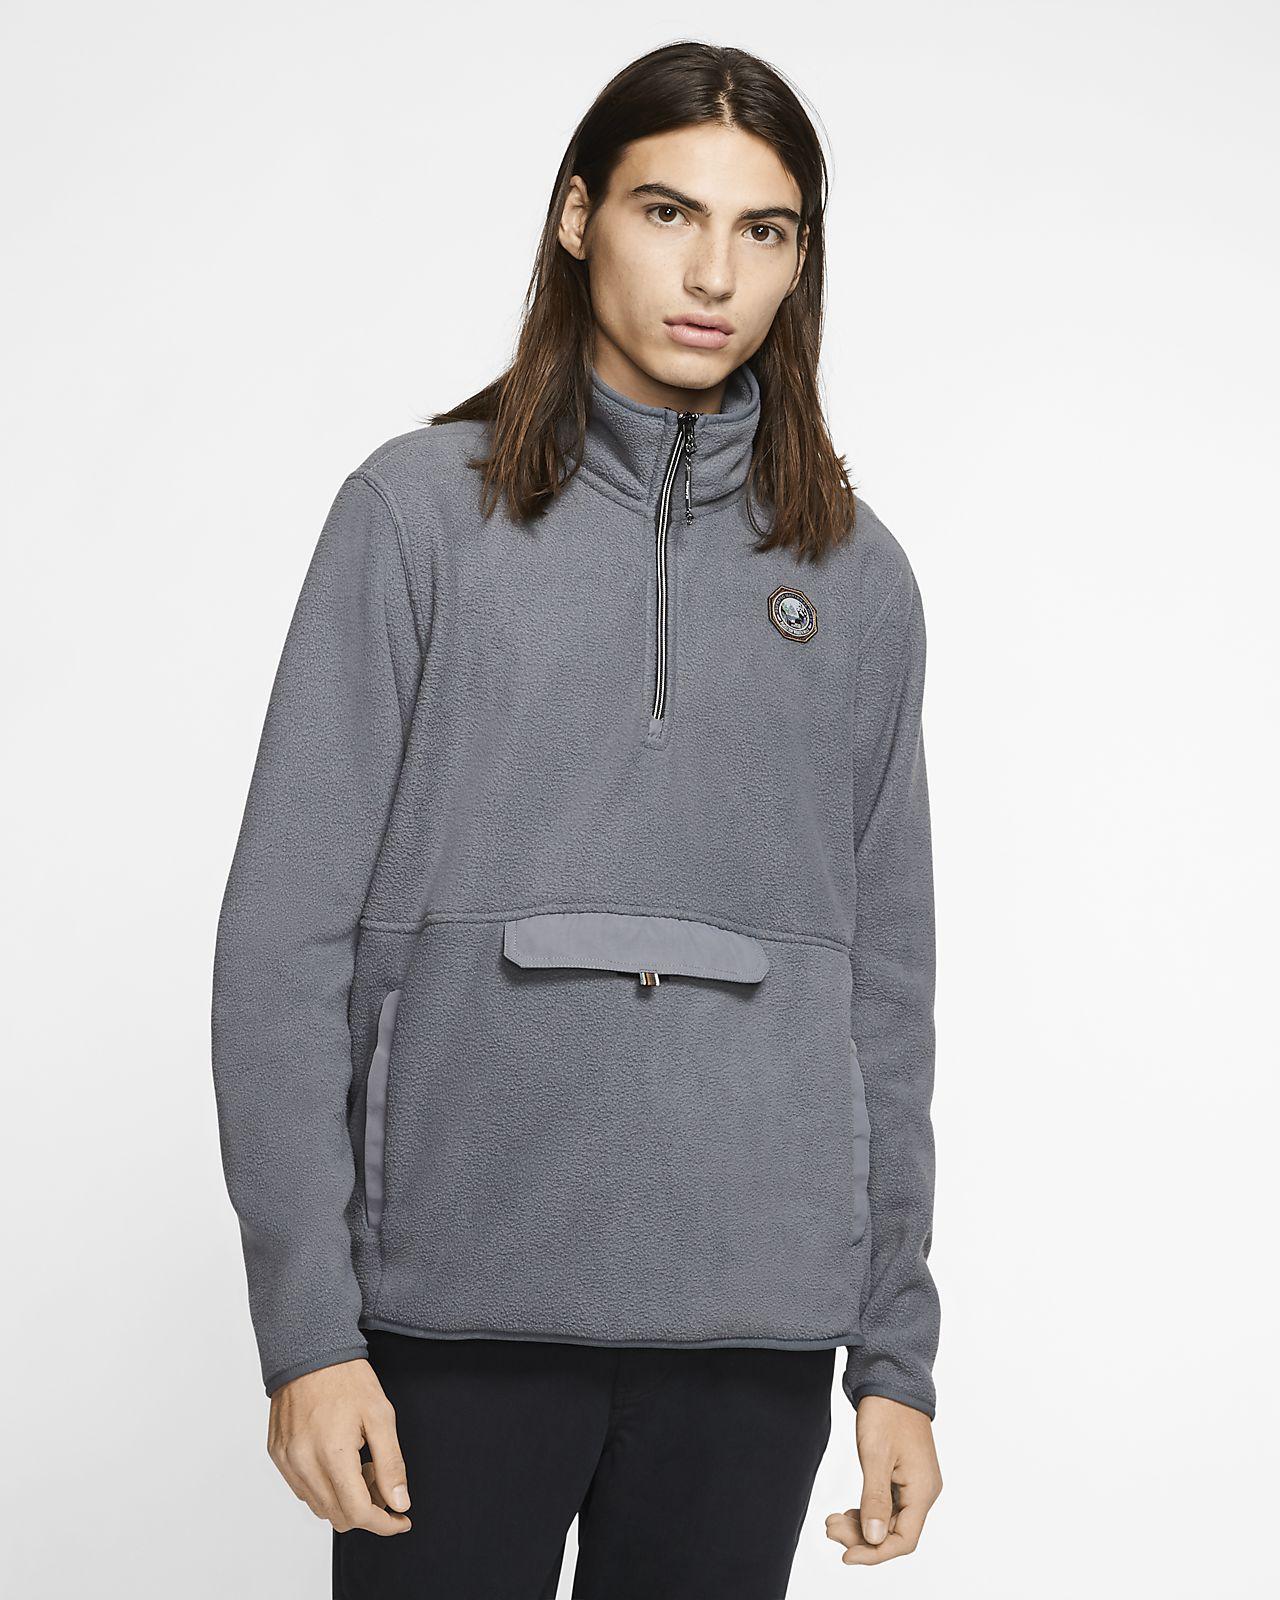 Hurley x Pendleton Sherpa Men's Track Fleece